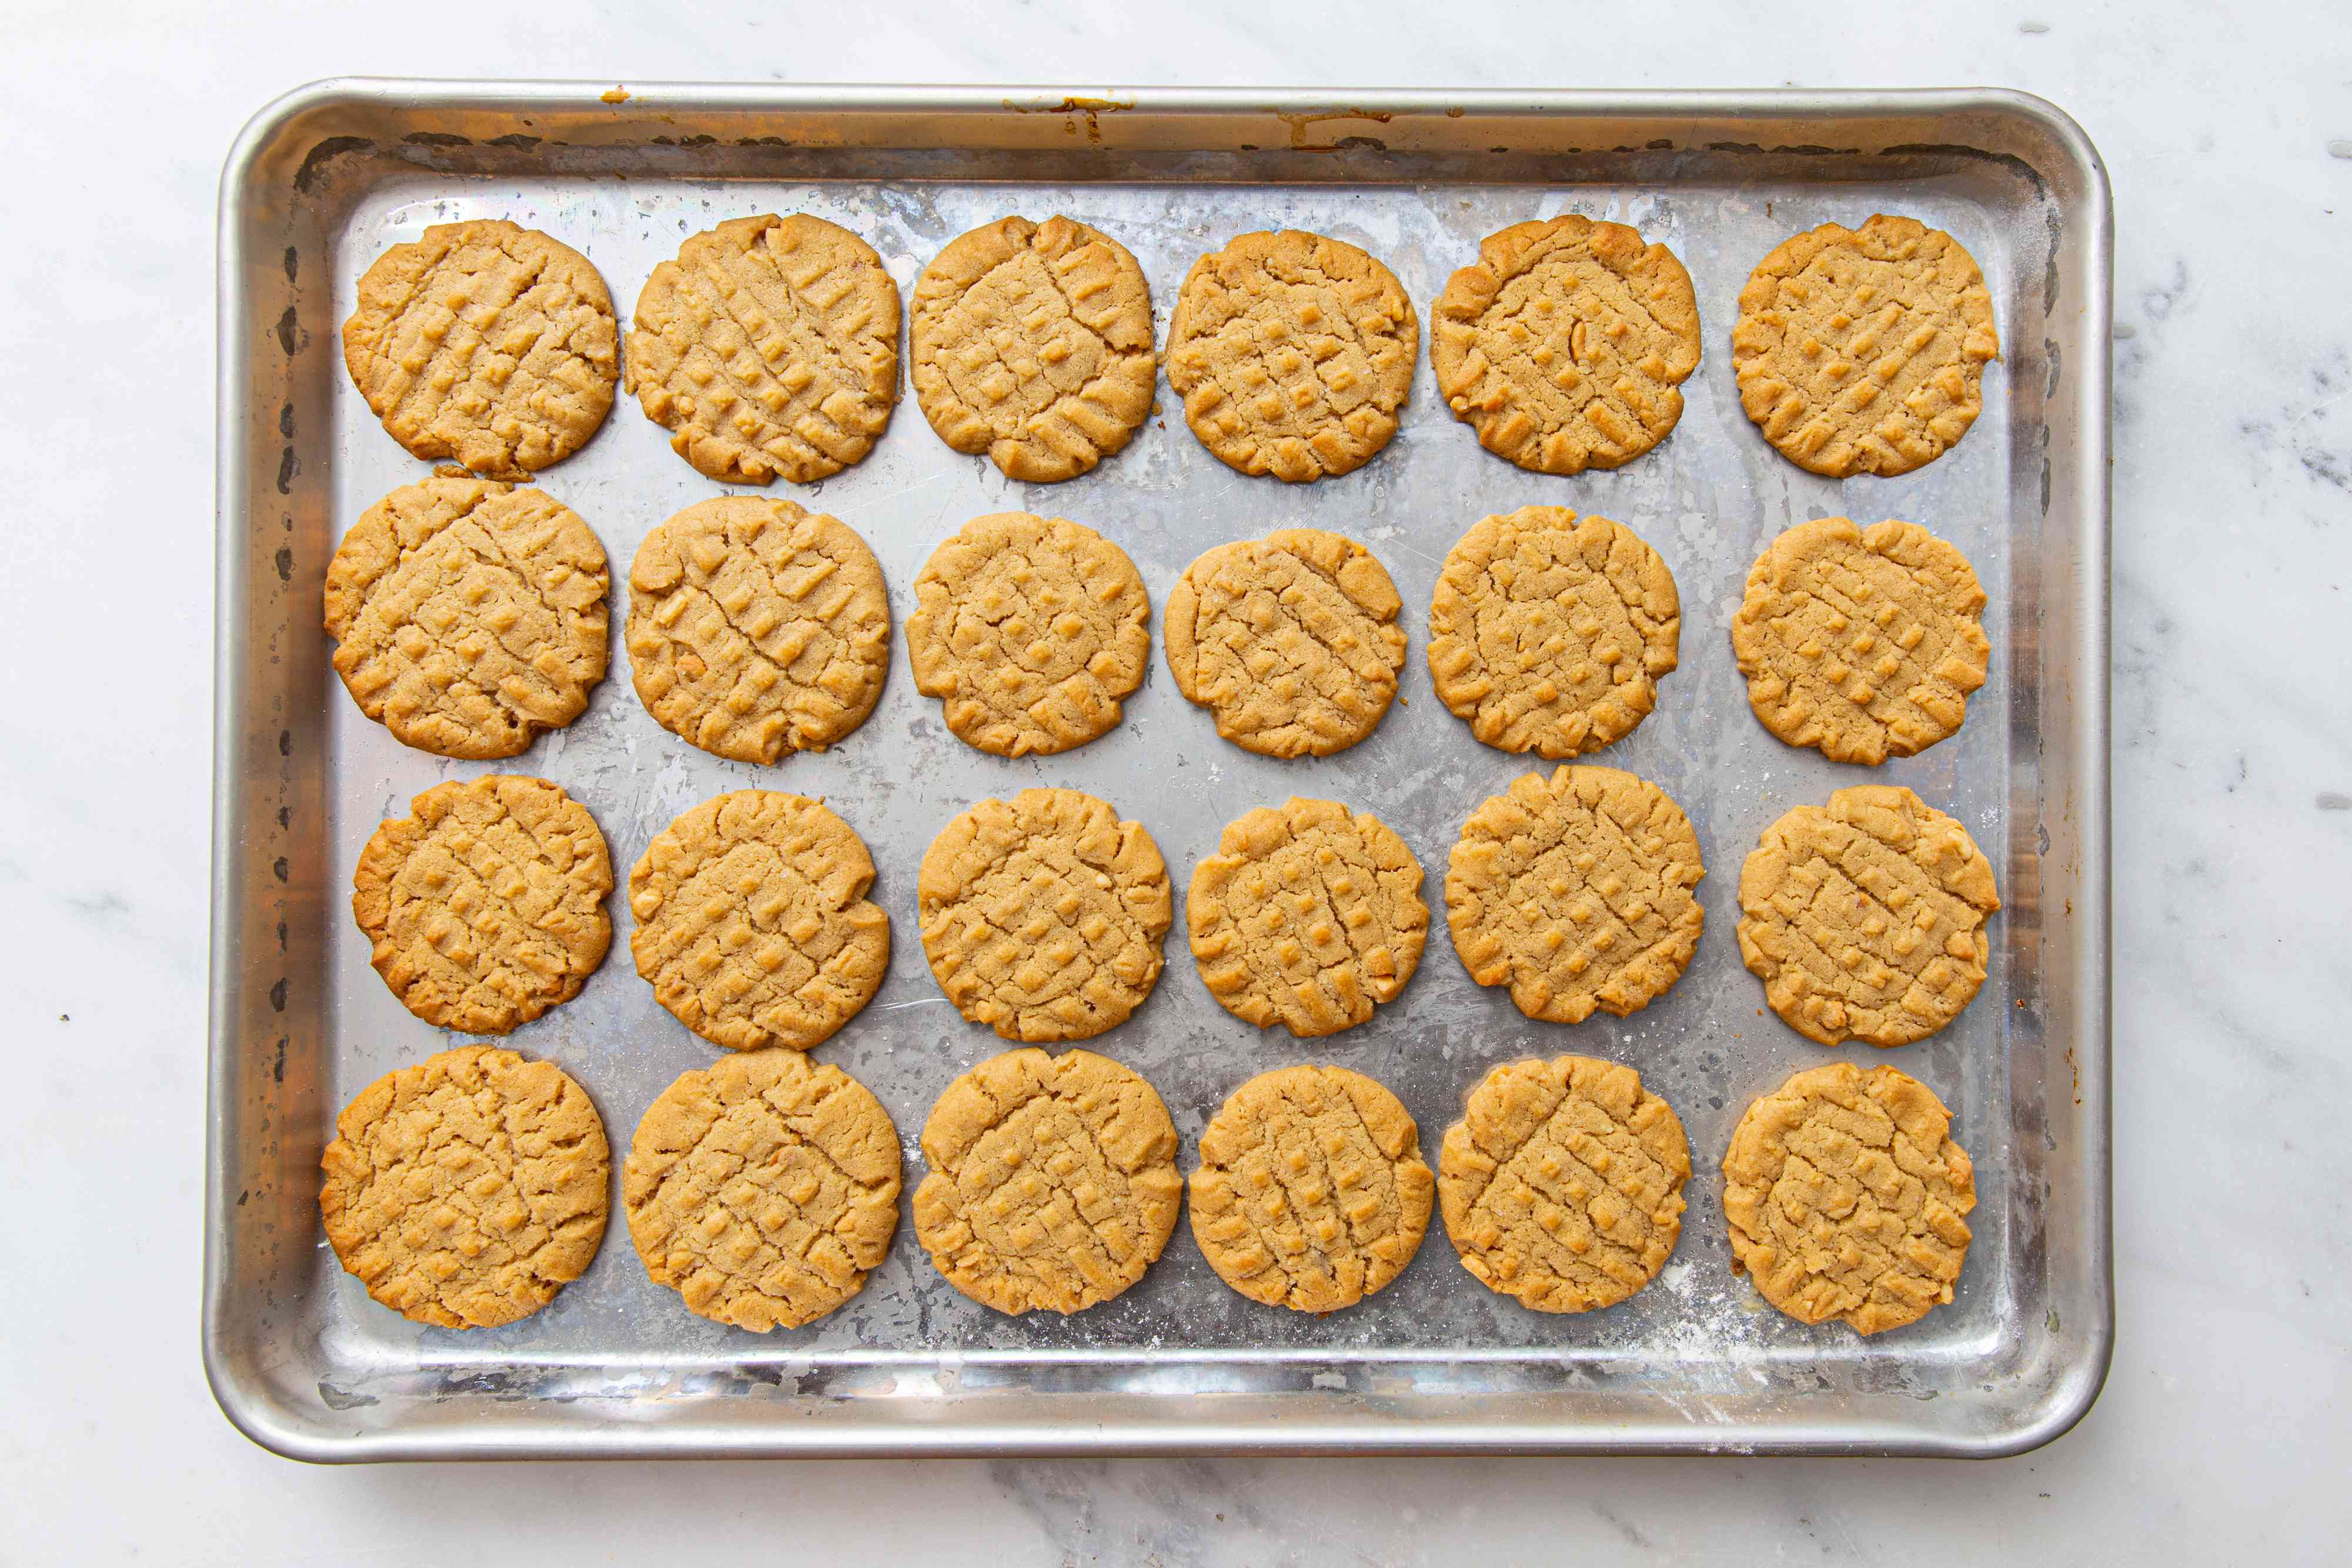 baked Crunchy Peanut Butter Cookies on a sheet pan